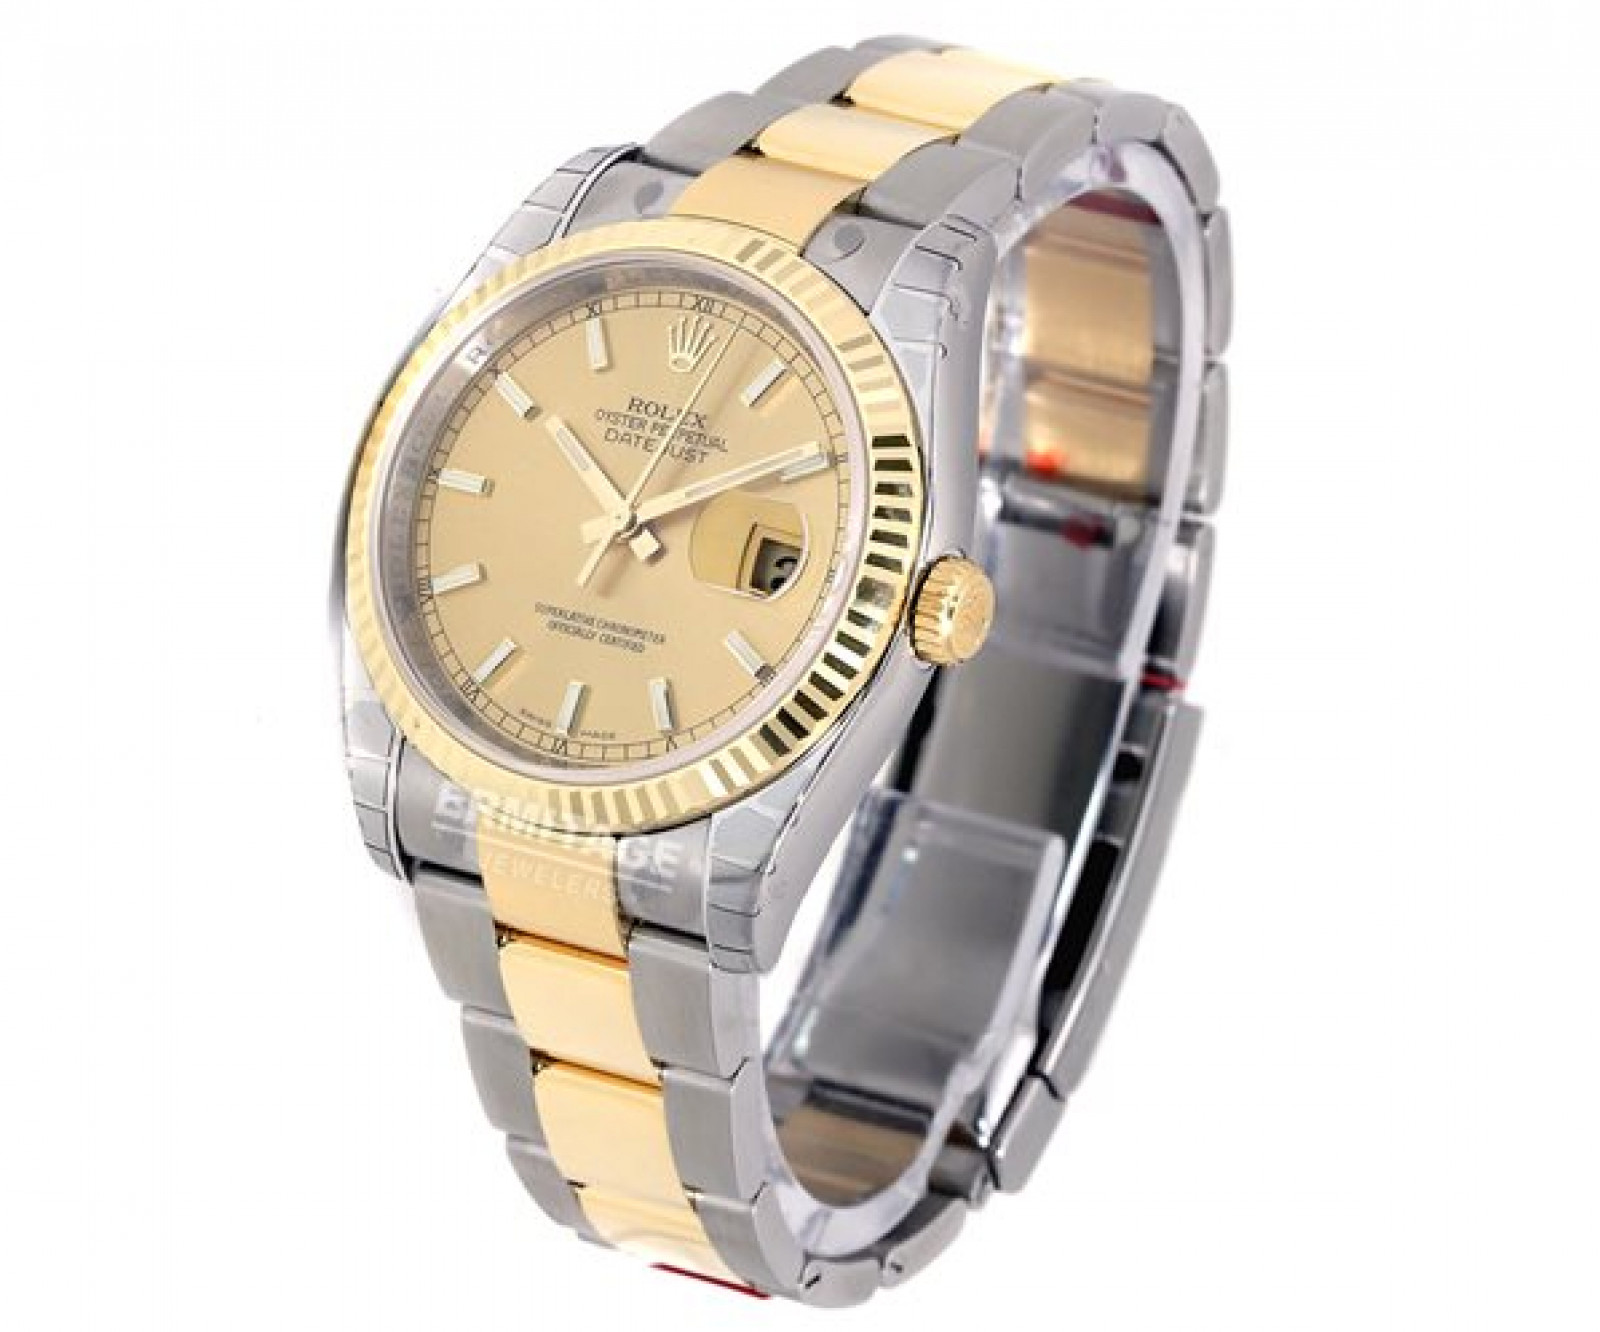 Men's Rolex Datejust 116233 with Oyster Bracelet